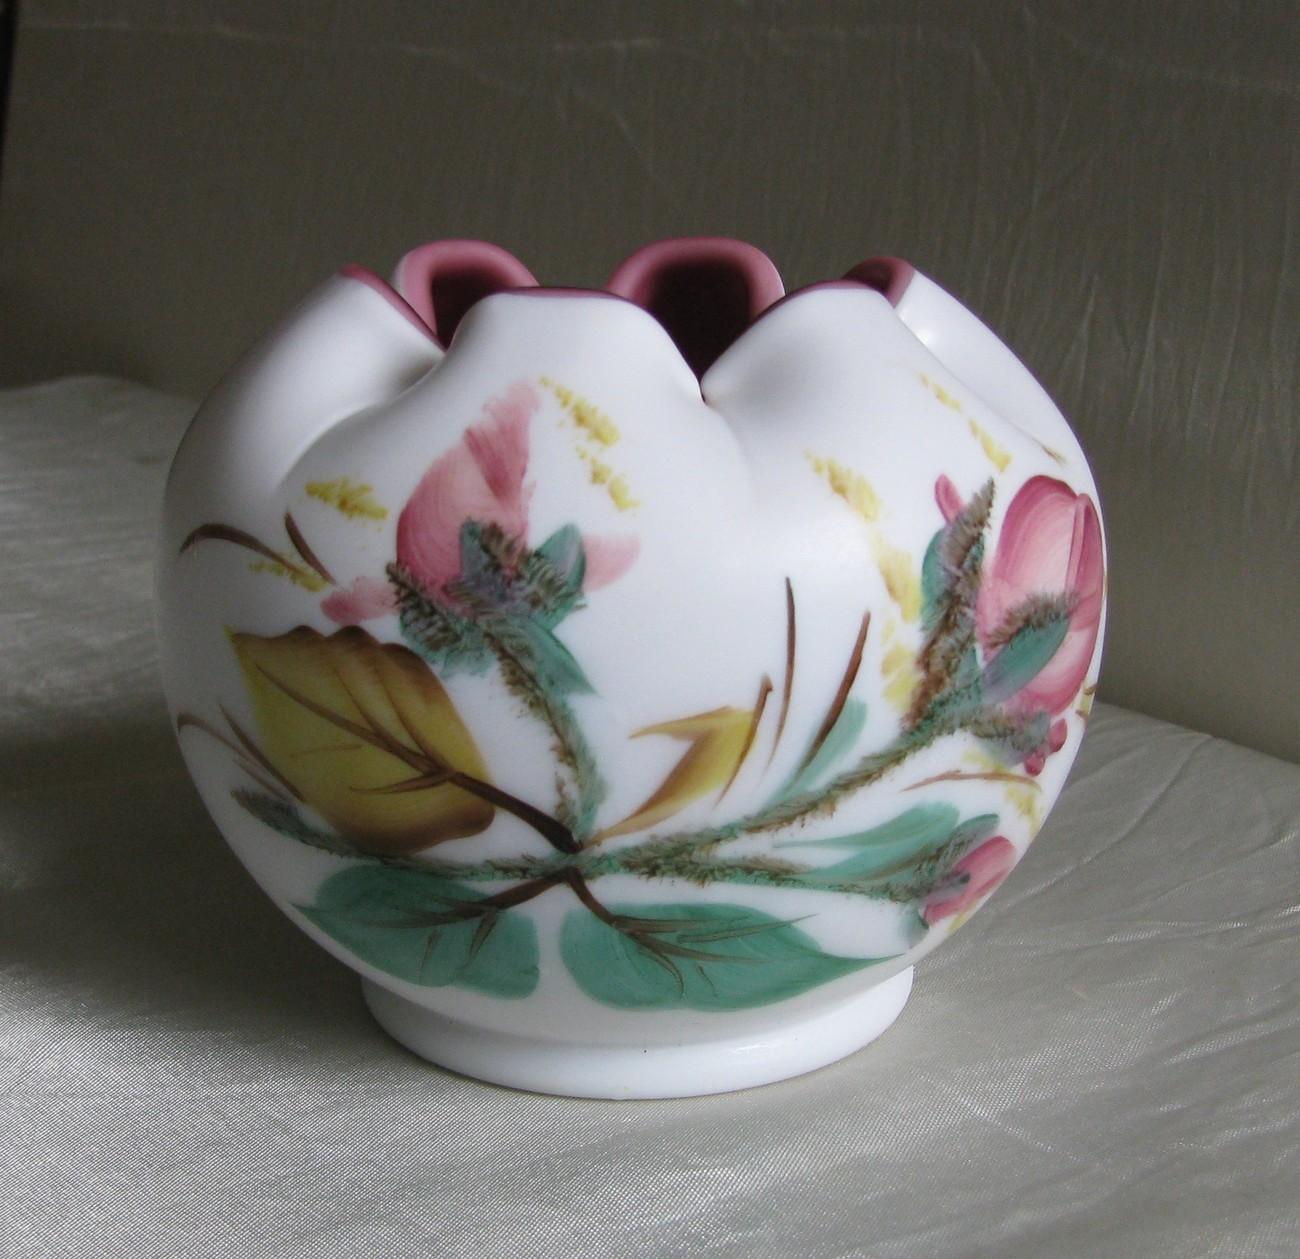 Lgw mroses rose bowl1